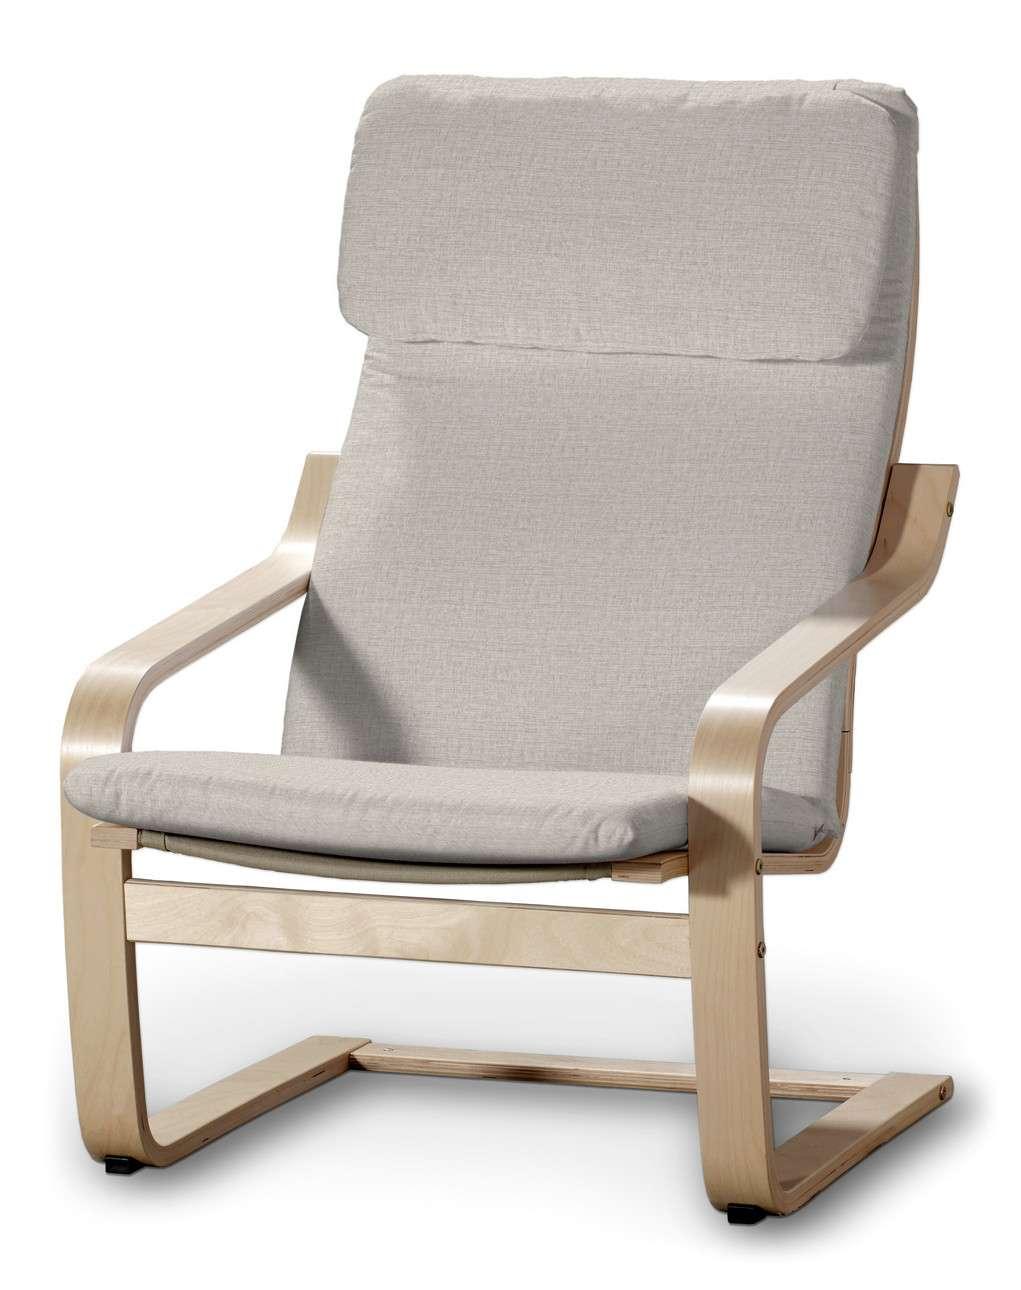 Poduszka na fotel Poäng w kolekcji Living, tkanina: 161-00